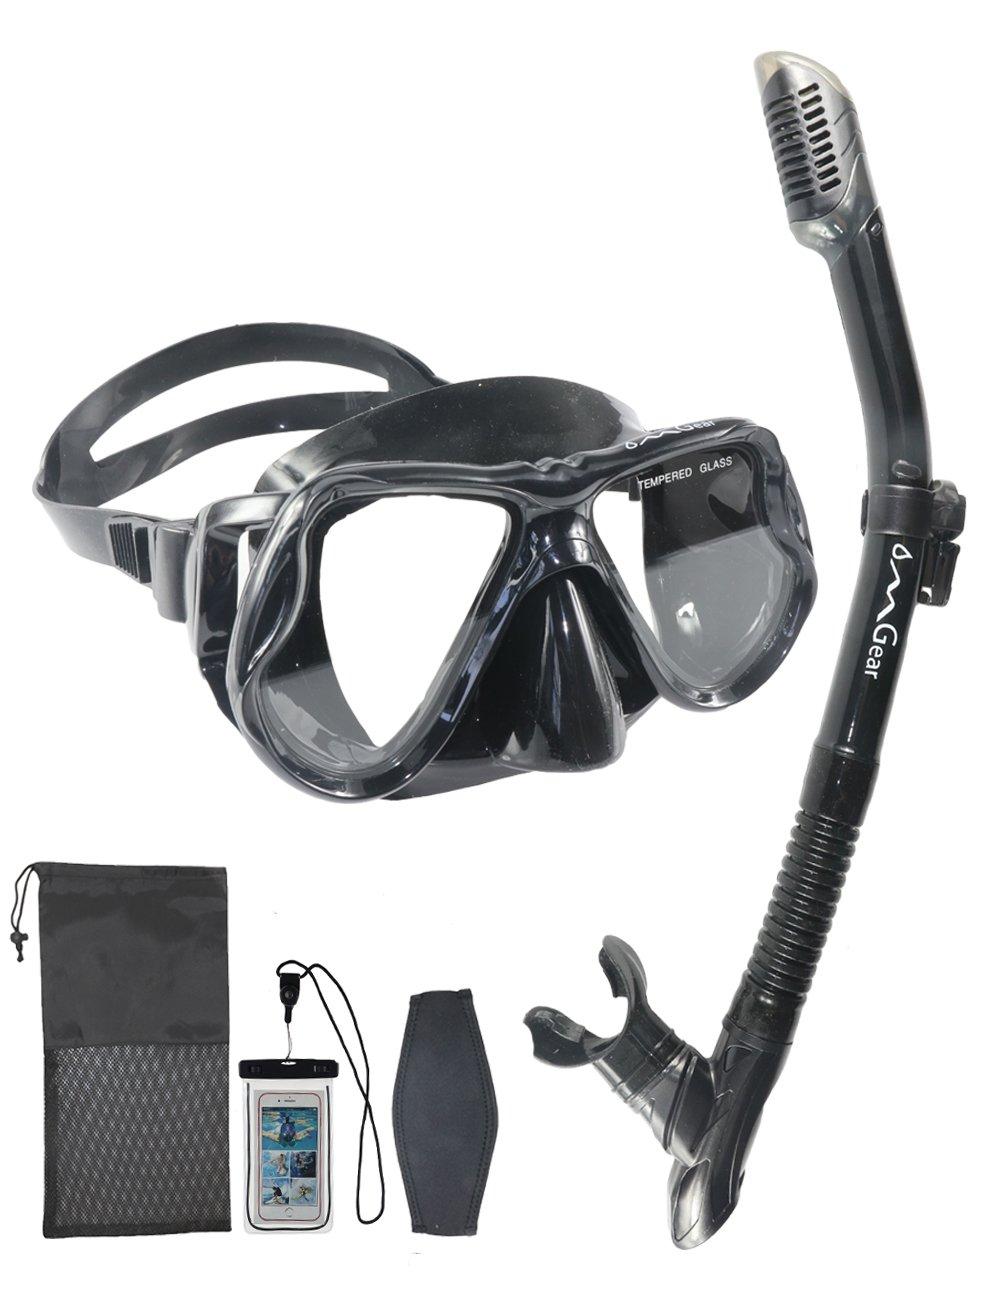 2dabc3da0c19 OMGear Snorkel Set Snorkeling Mask Dry Snorkel Neoprene Mask Strap  Waterproof Phone Case Swimming Scuba Diving Freediving (Black)